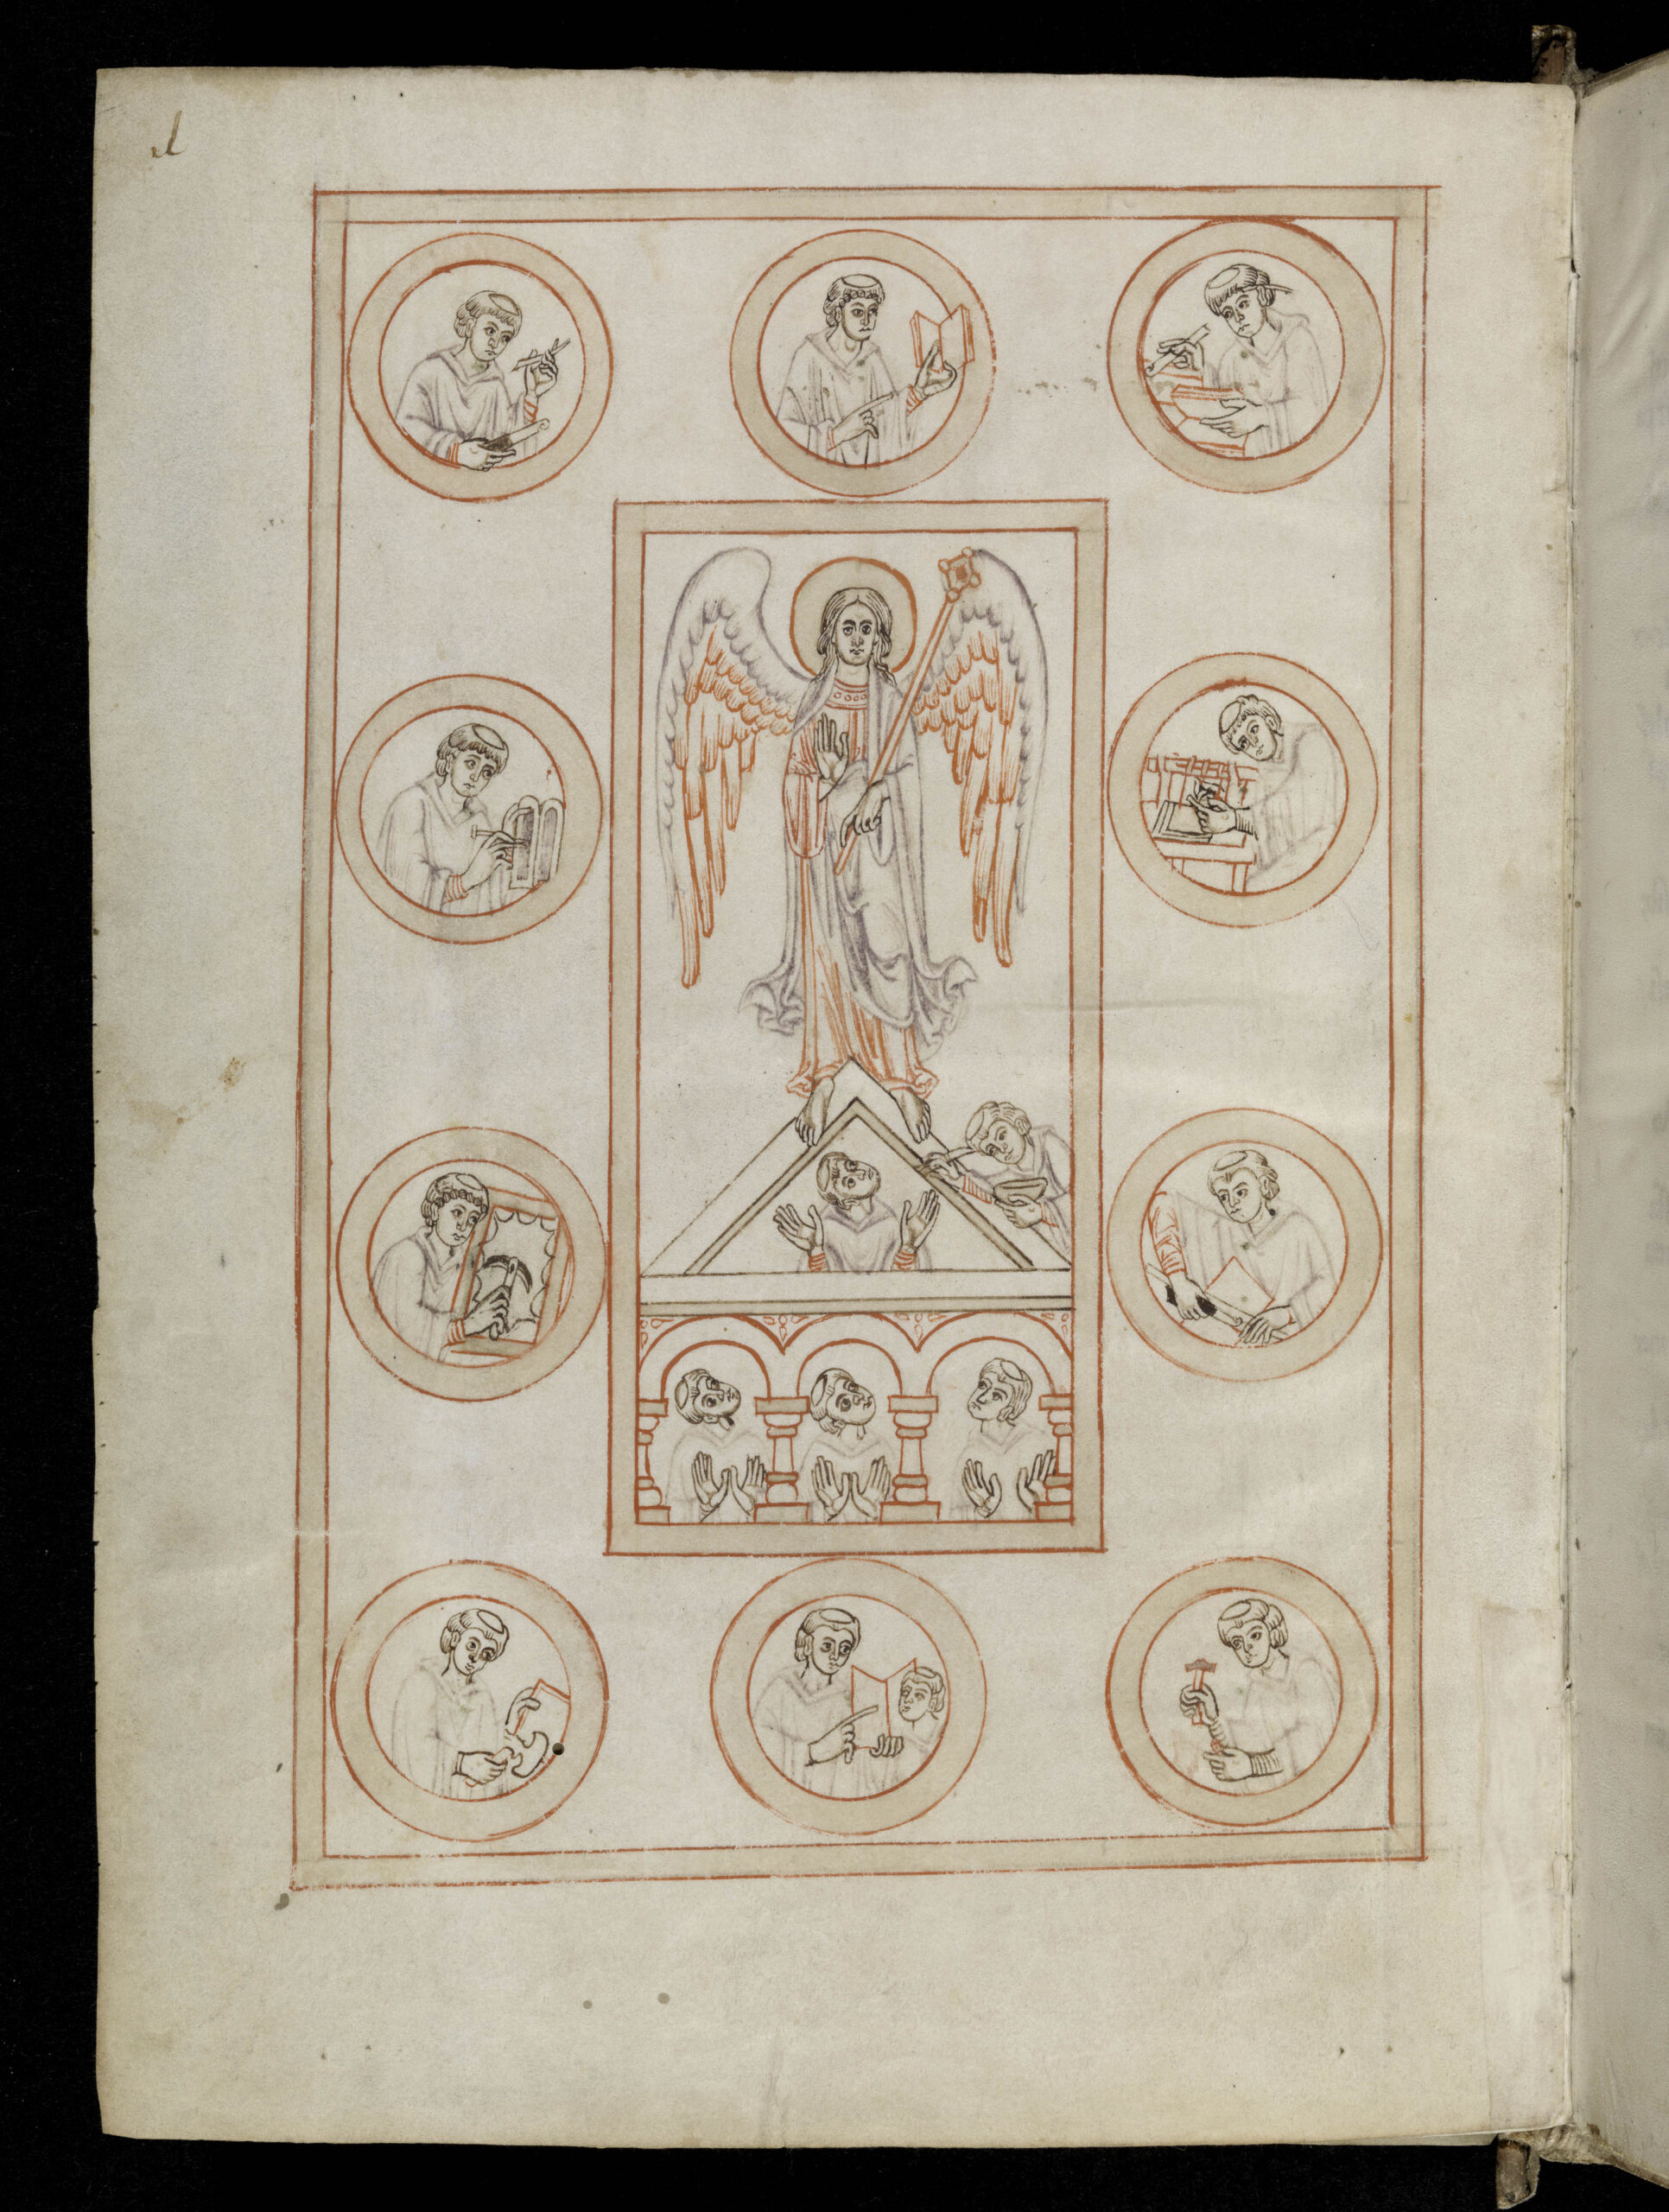 Bamberg, Staatsbibliothek, Ms. Patr. 5, fol. 1v